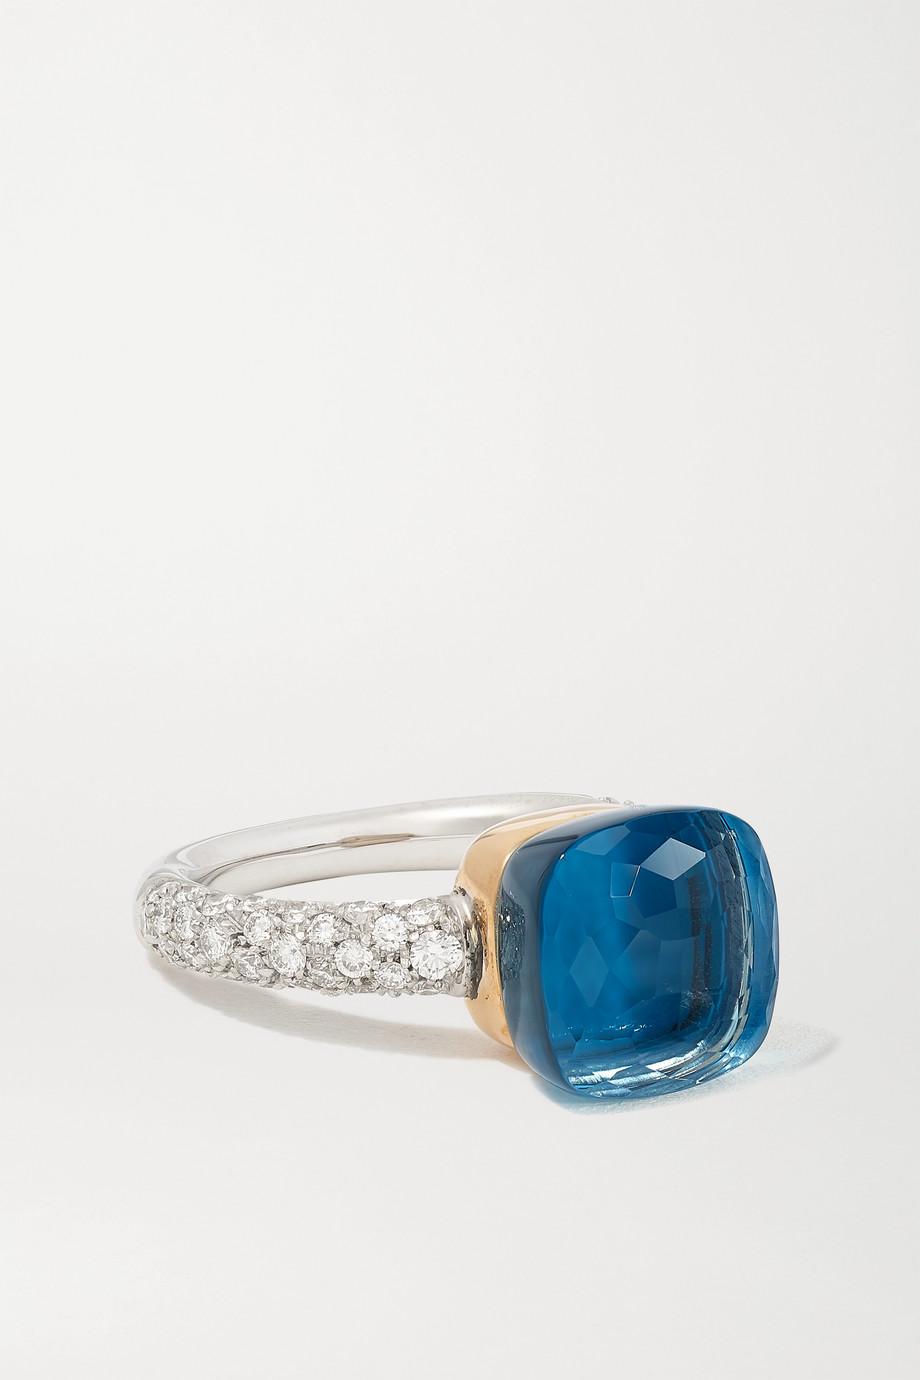 Pomellato Nudo 18-karat white and rose gold multi-stone ring